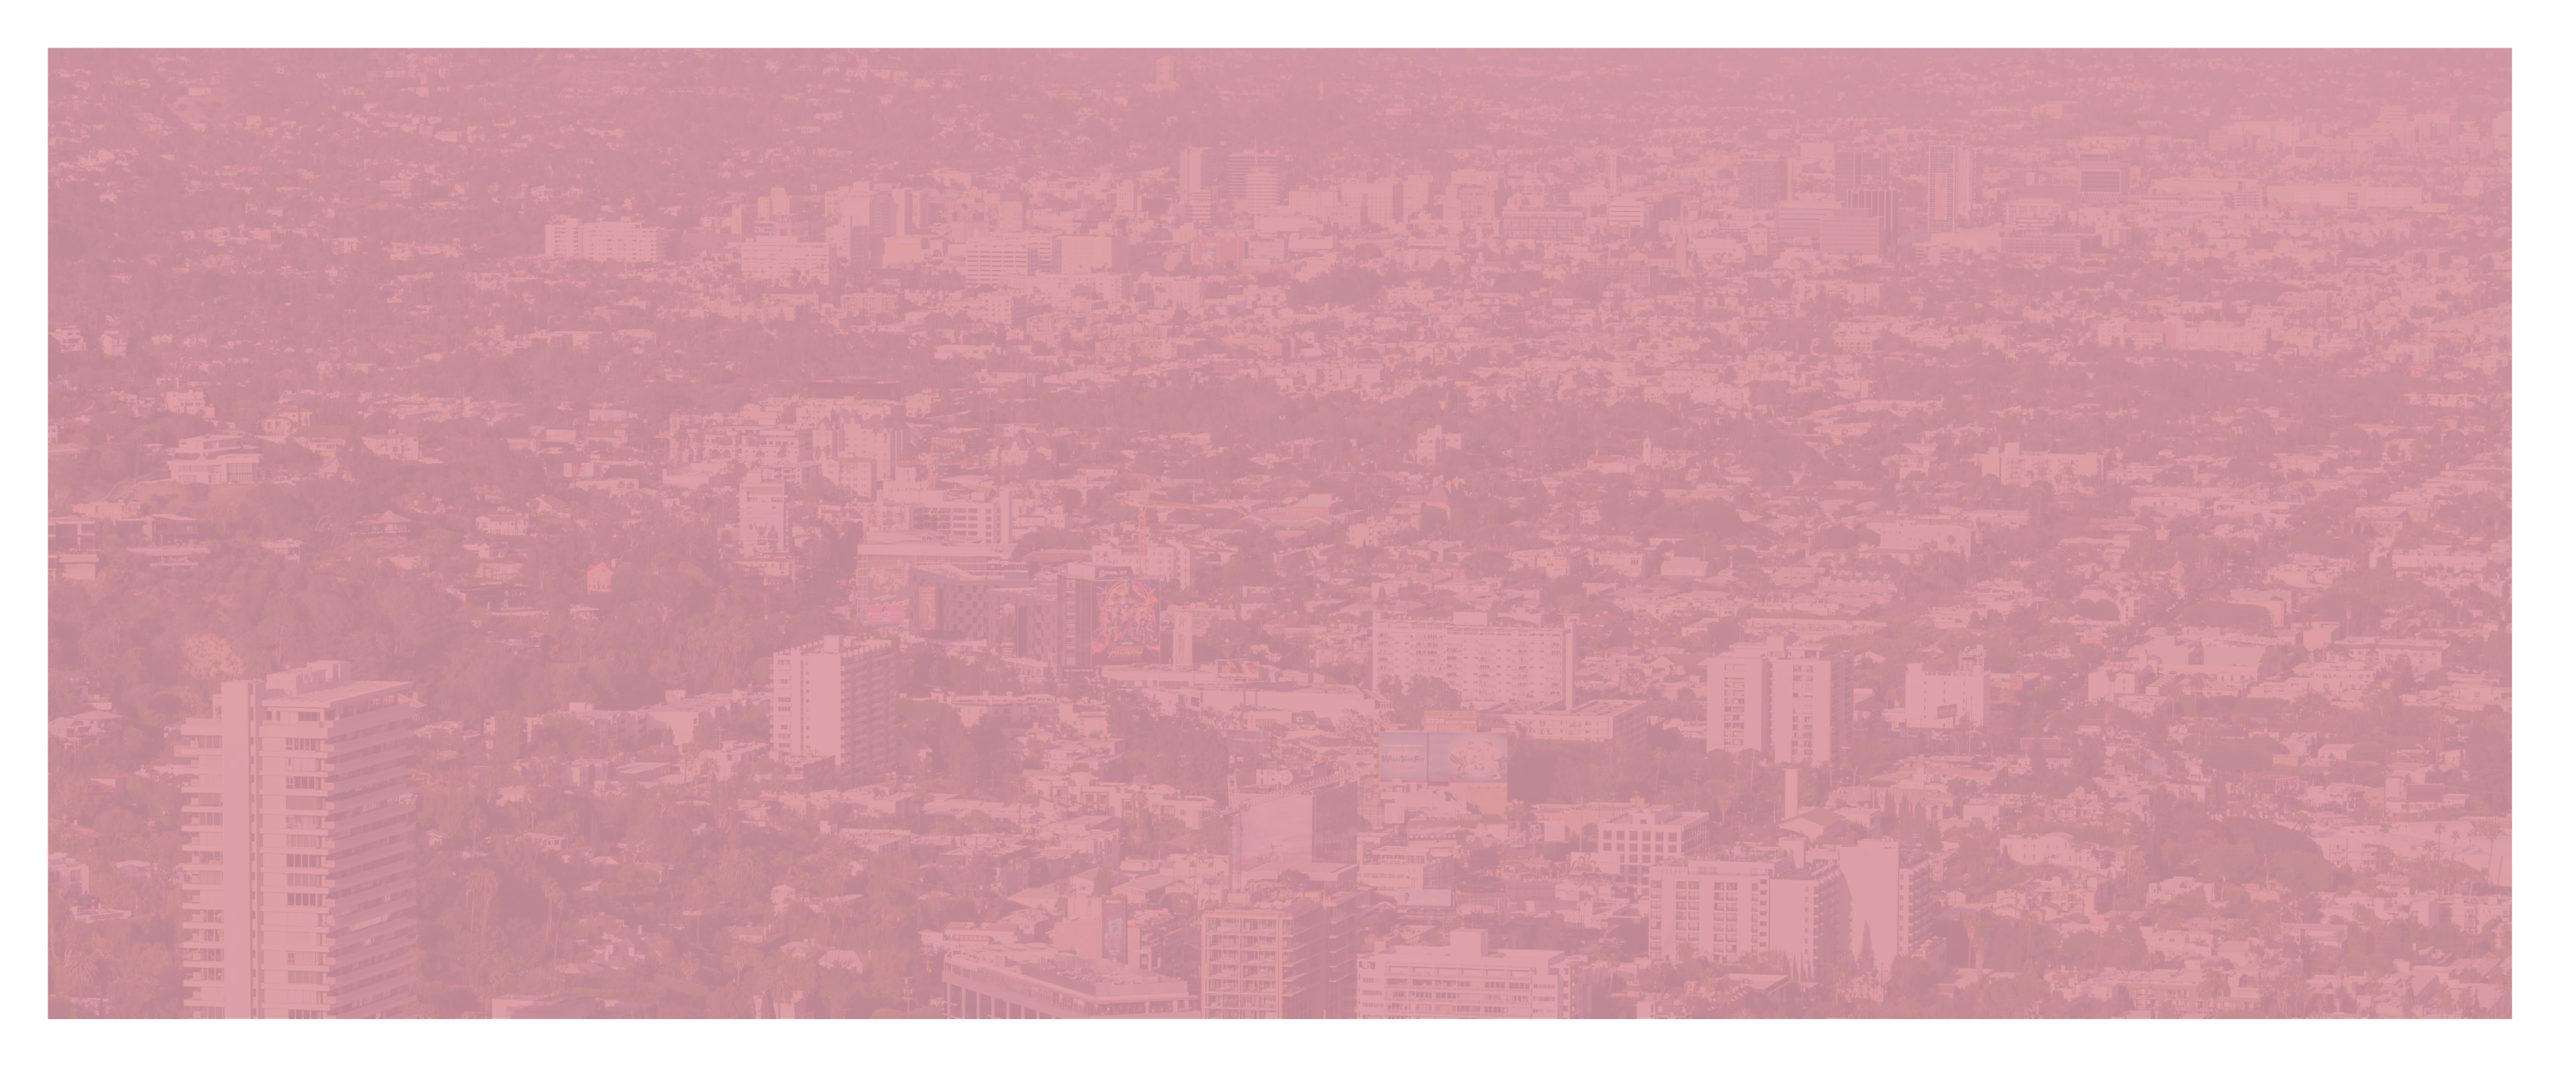 TheDahlia-West-Hollywood-Location